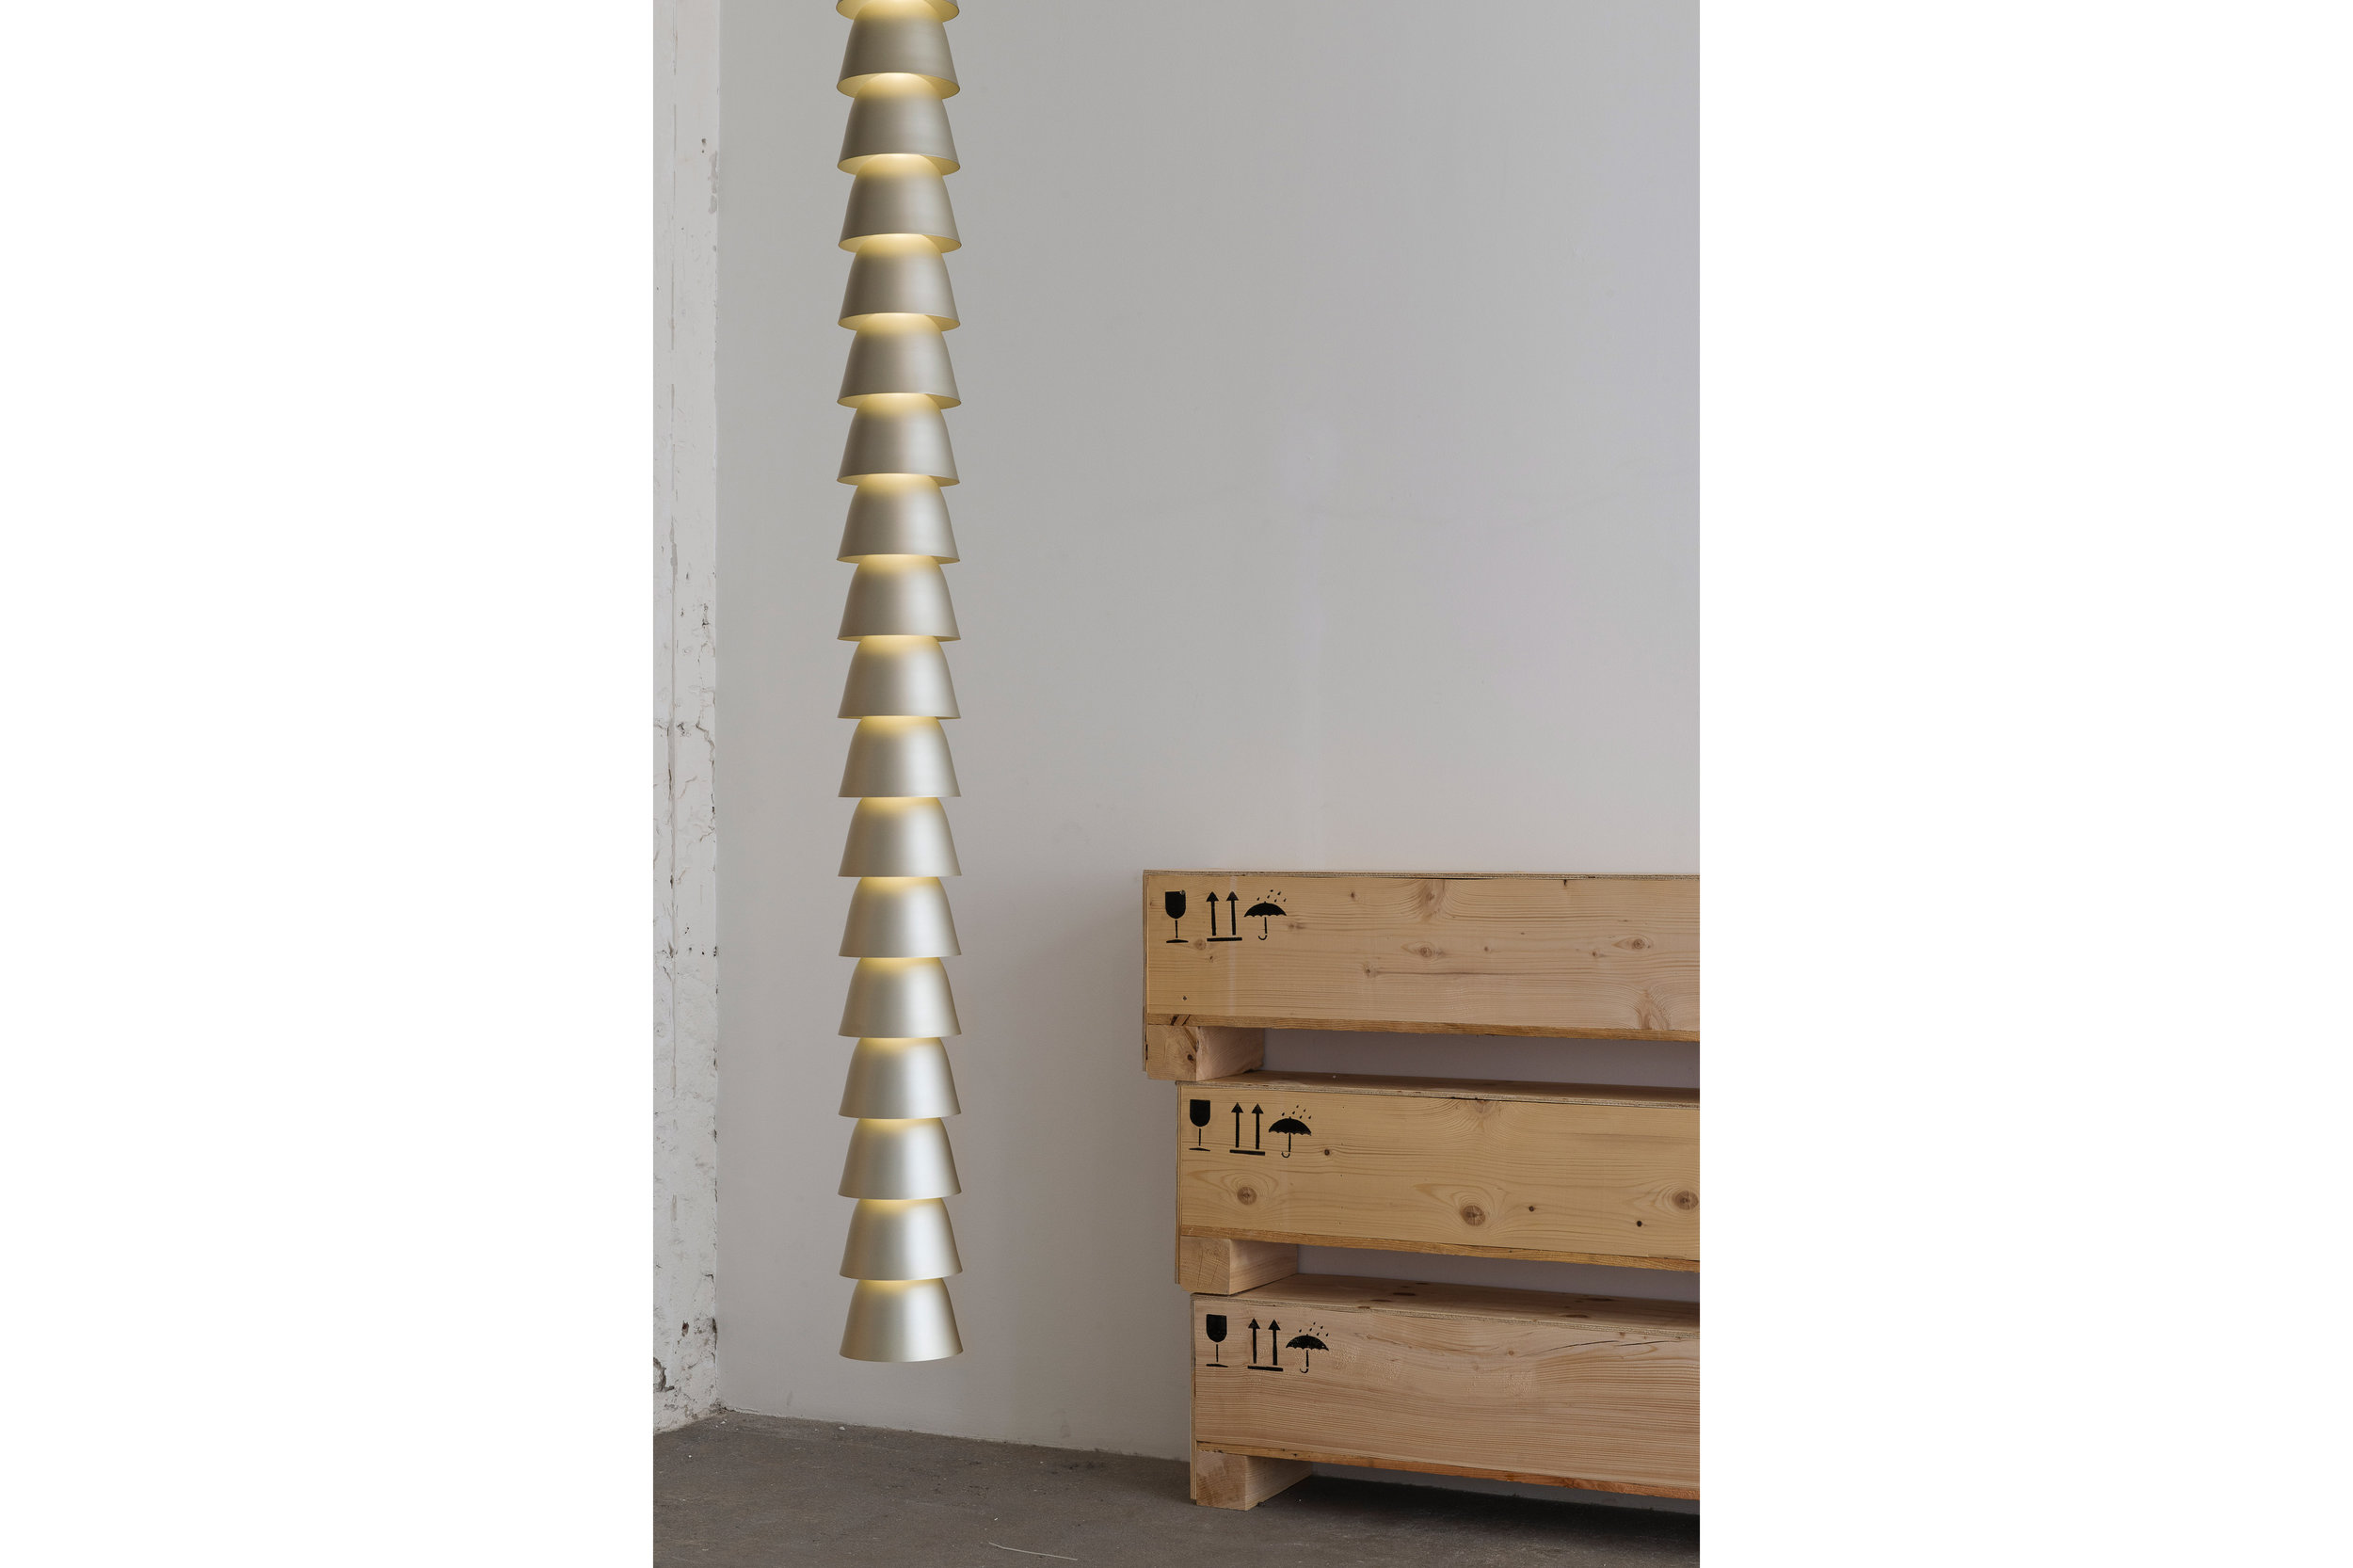 chains-by-ronan-erwan-bouroullec-galerie-kreo-exhibition_dezeen_2364_col_21.jpg